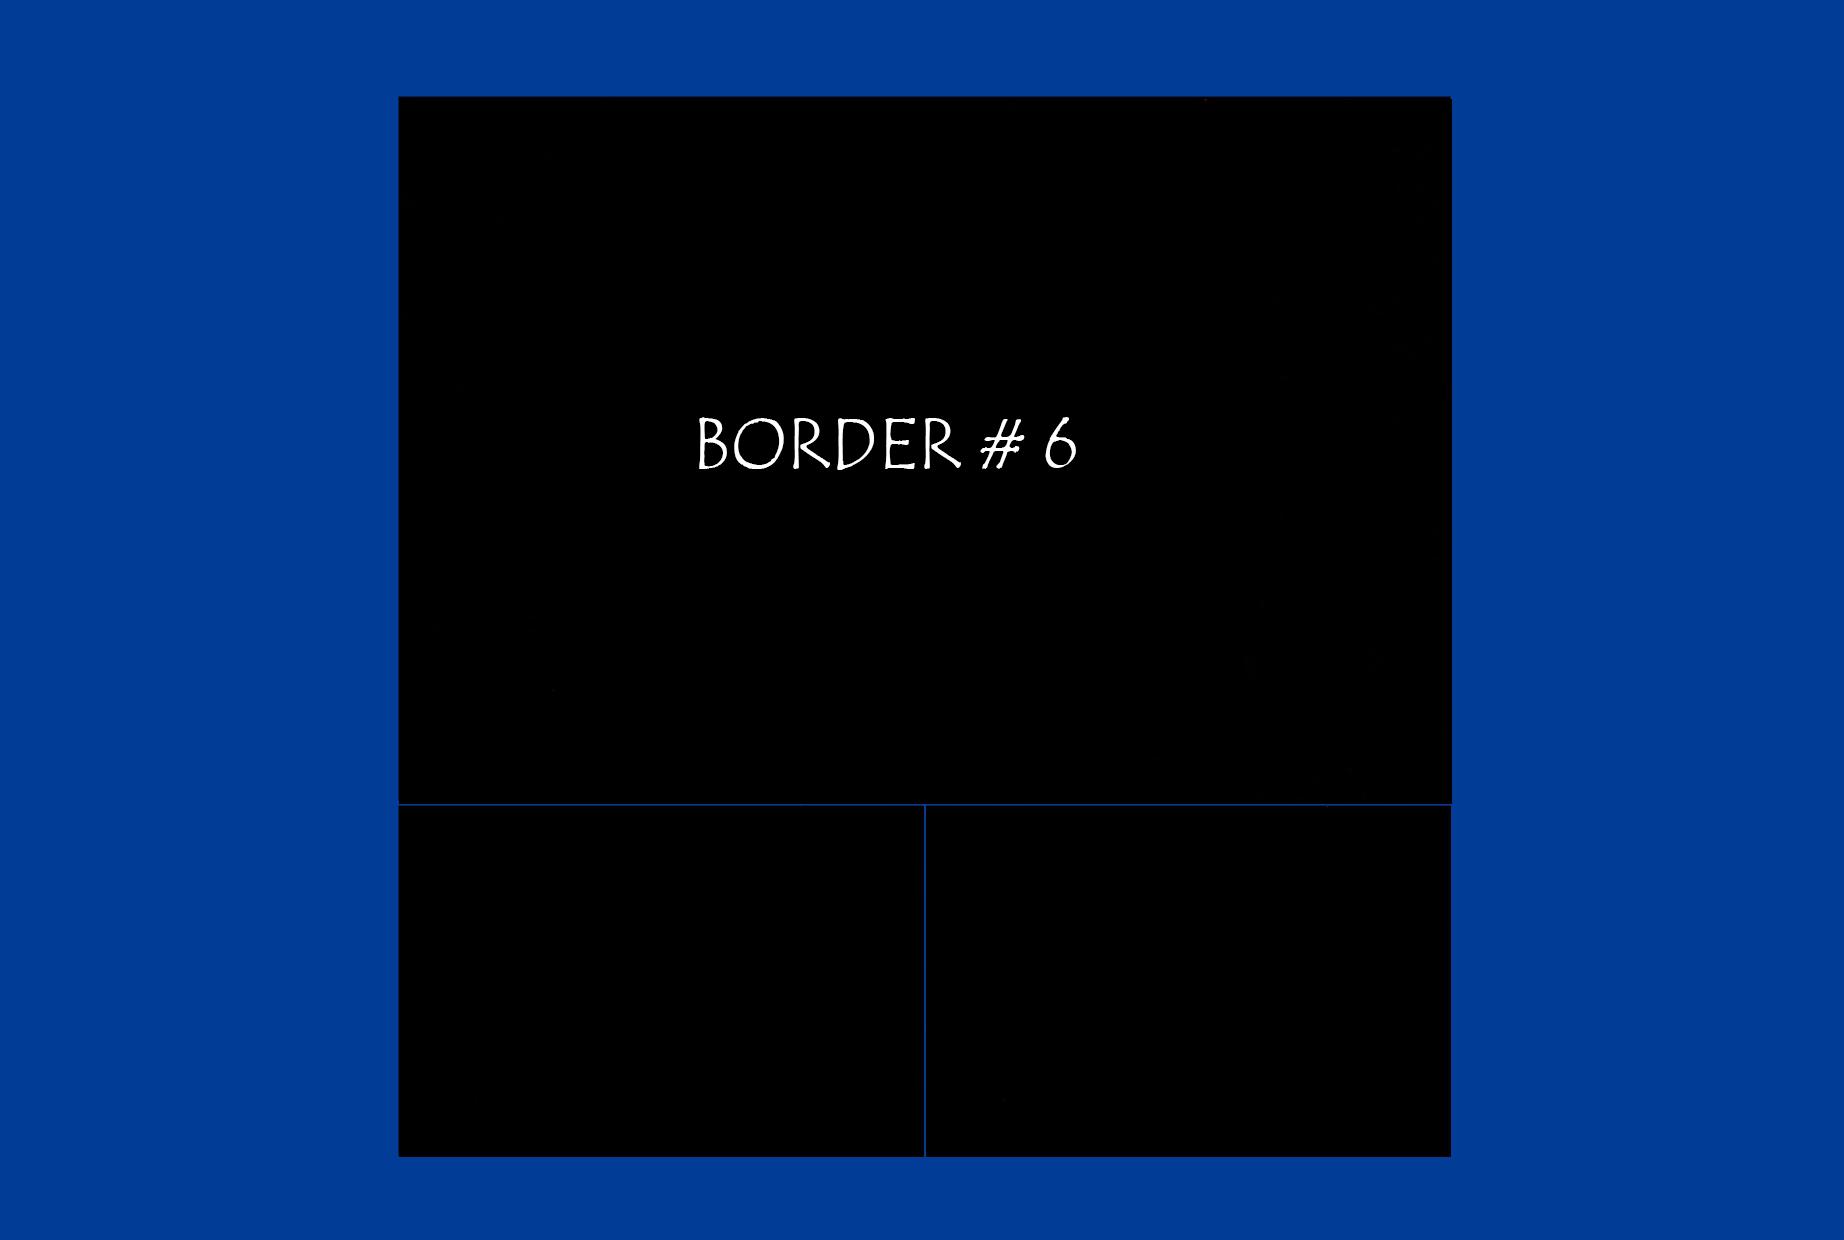 BORDER#6